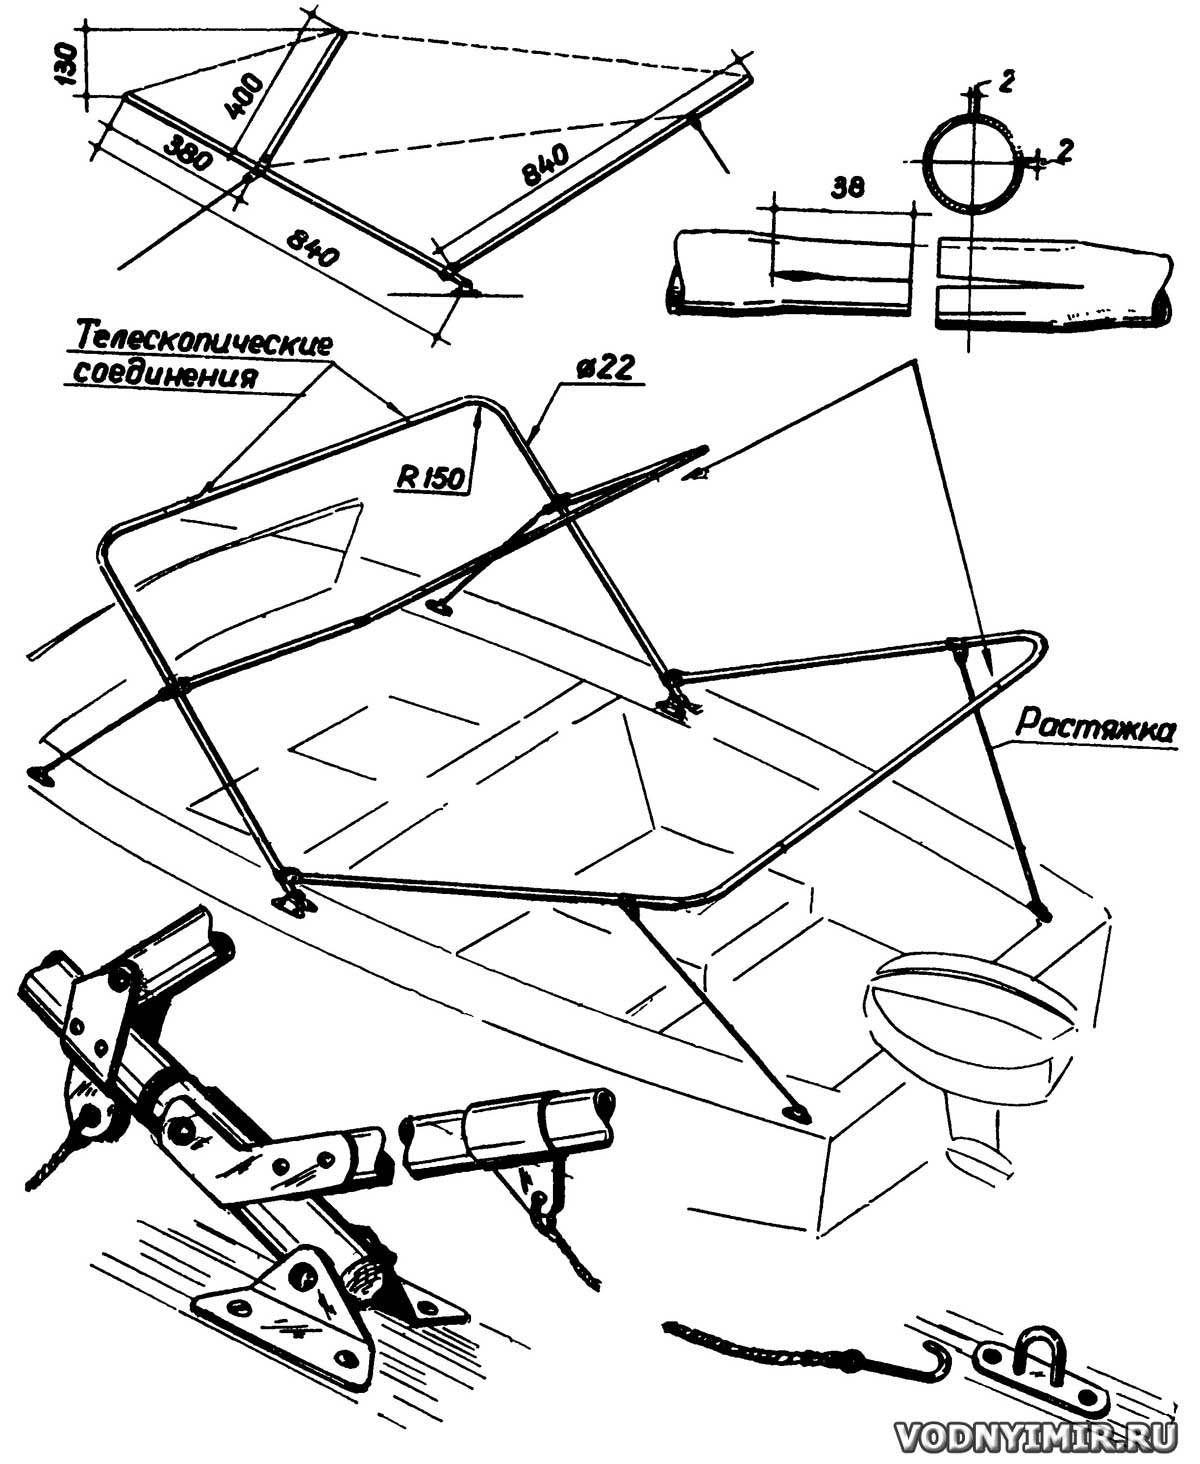 Прицеп - палатка/кухня/дача своими руками - Рыбалка без границ 42